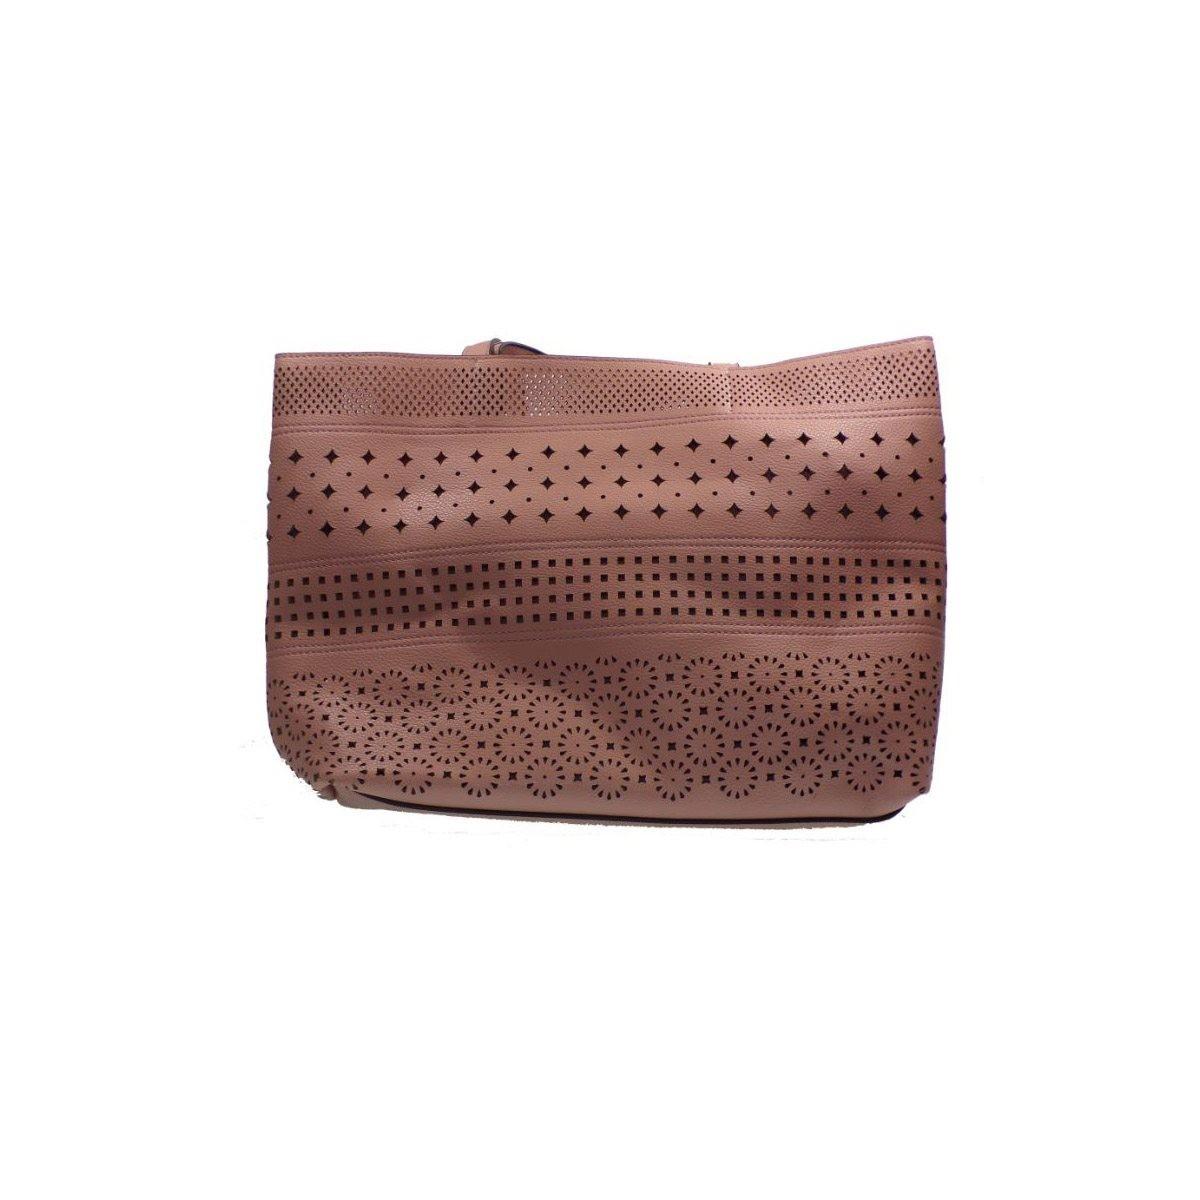 043972b5db BagiotaShoes Exe Bags Γυναικείες Τσάντες 8902 Ροζ exe bags 8902 roz